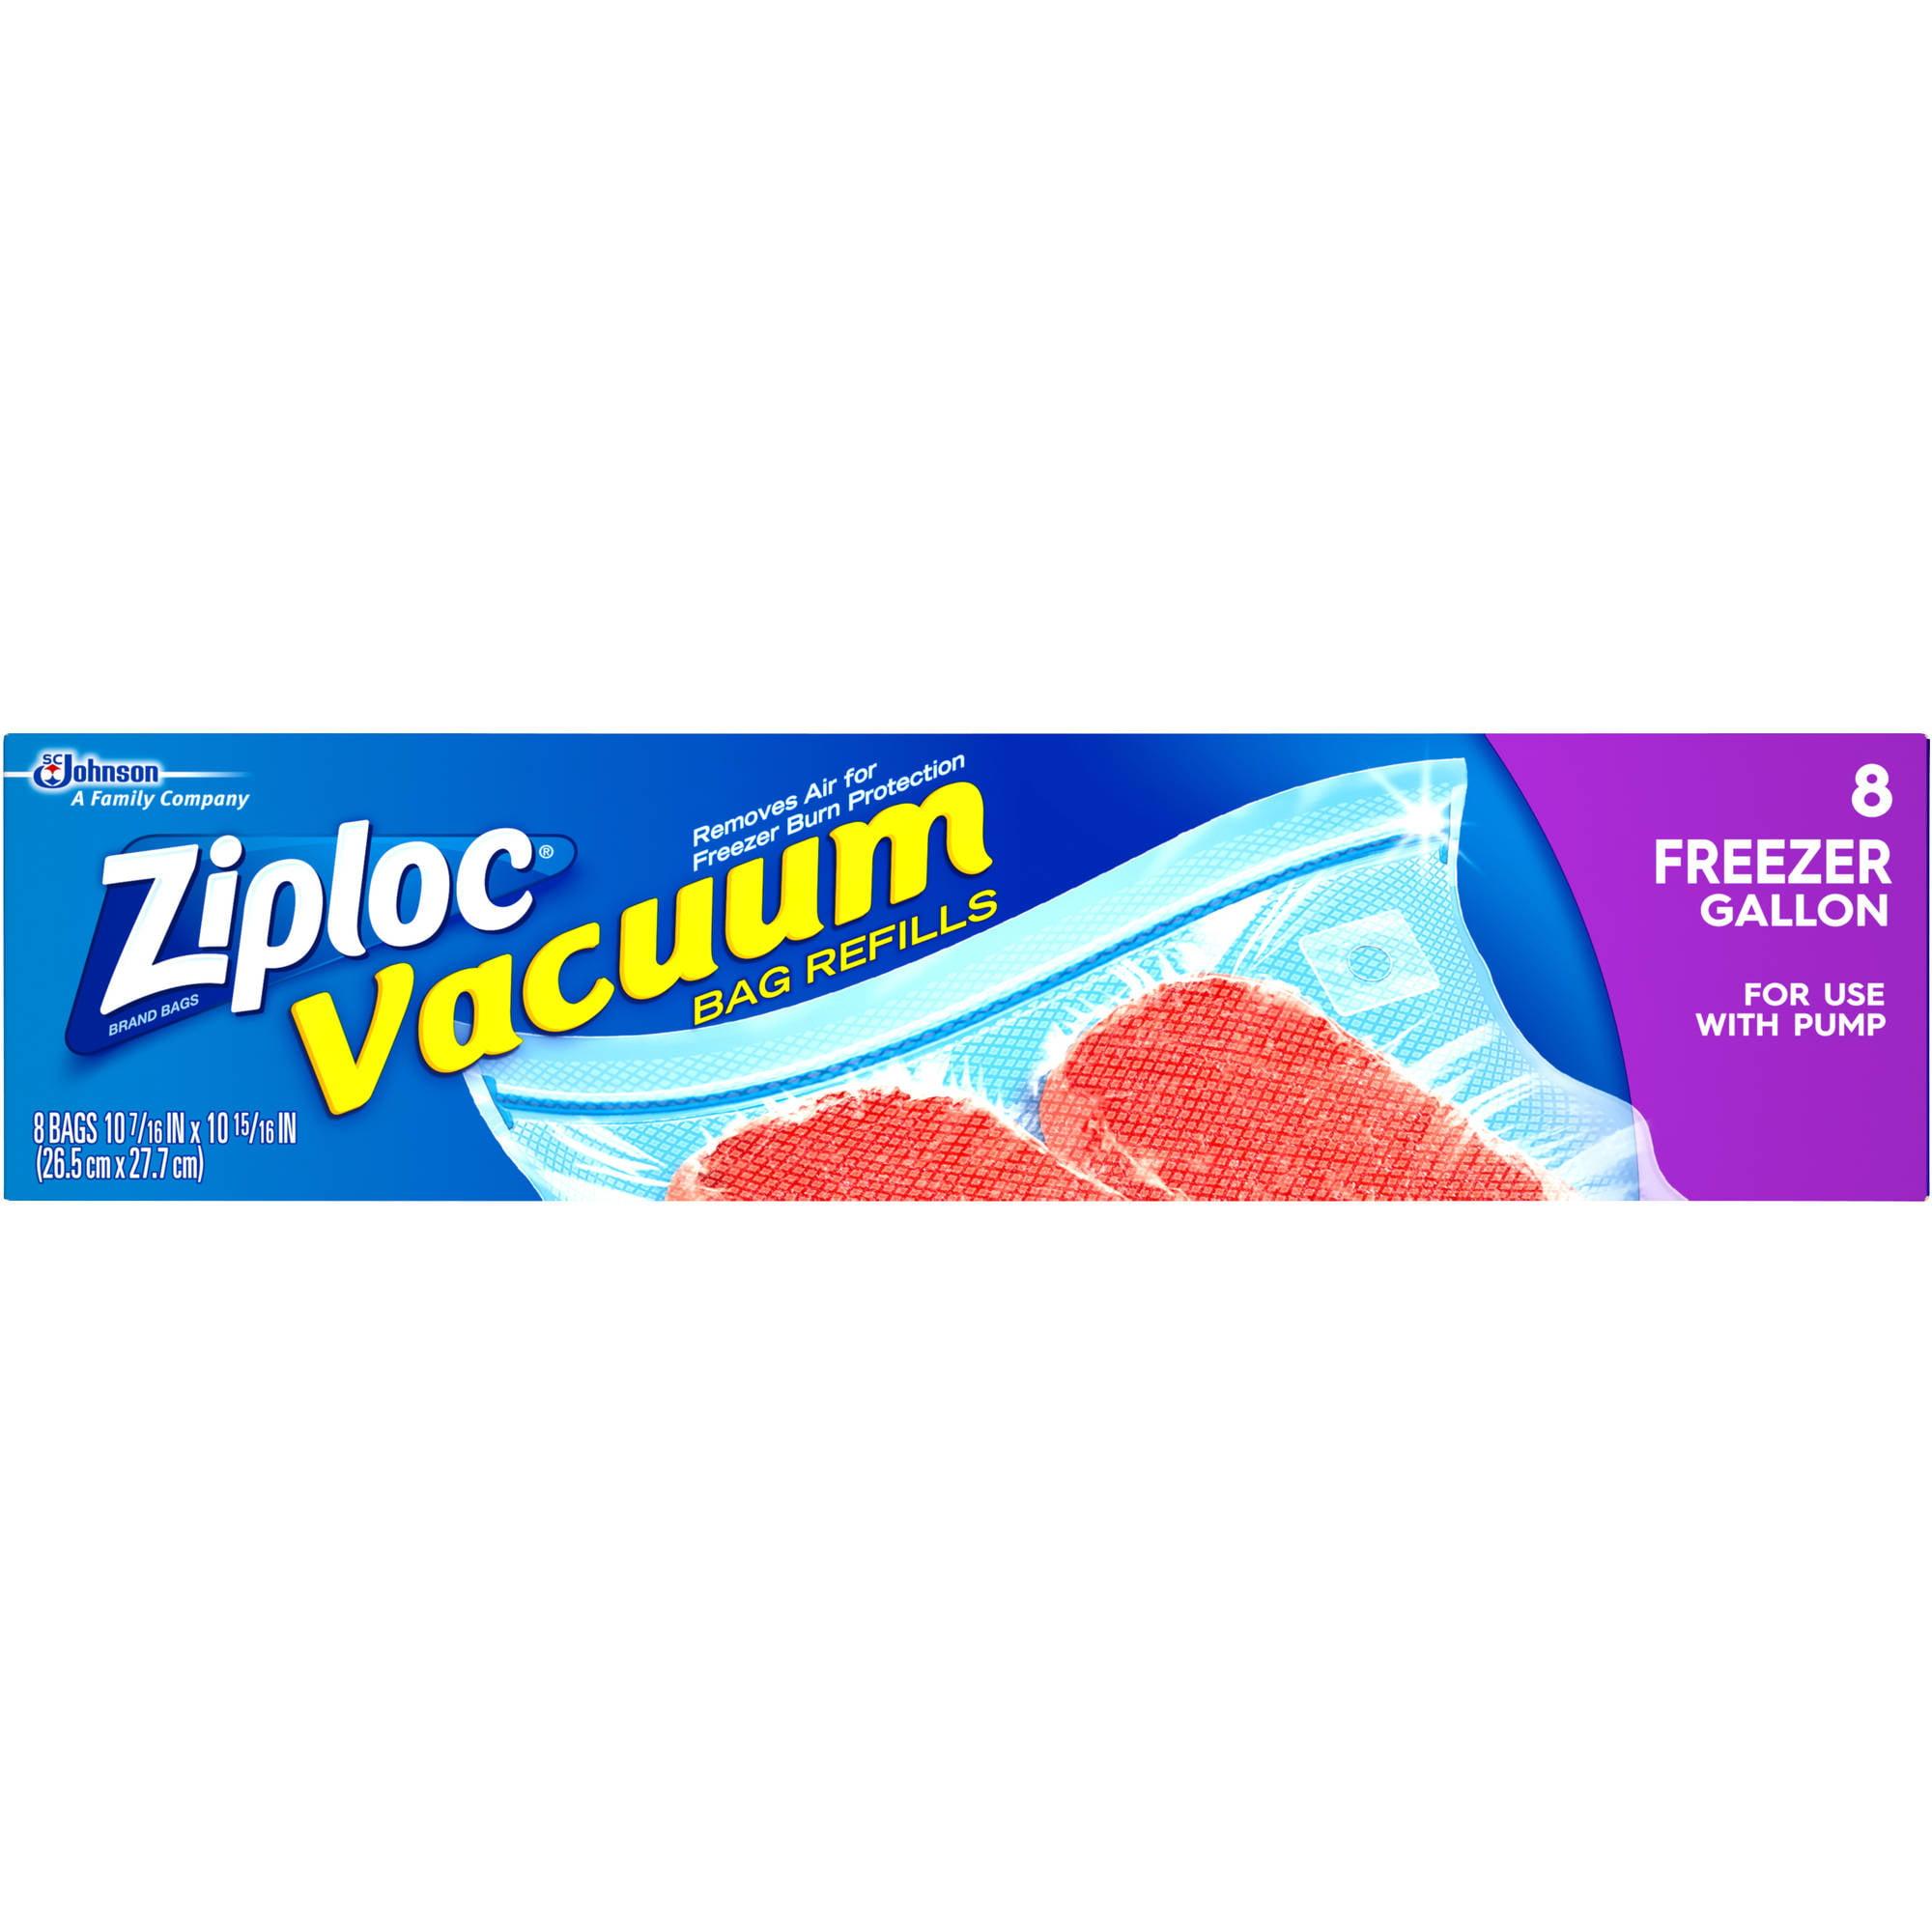 Ziploc Freezer Gallon Vacuum Bag Refills, 8 count